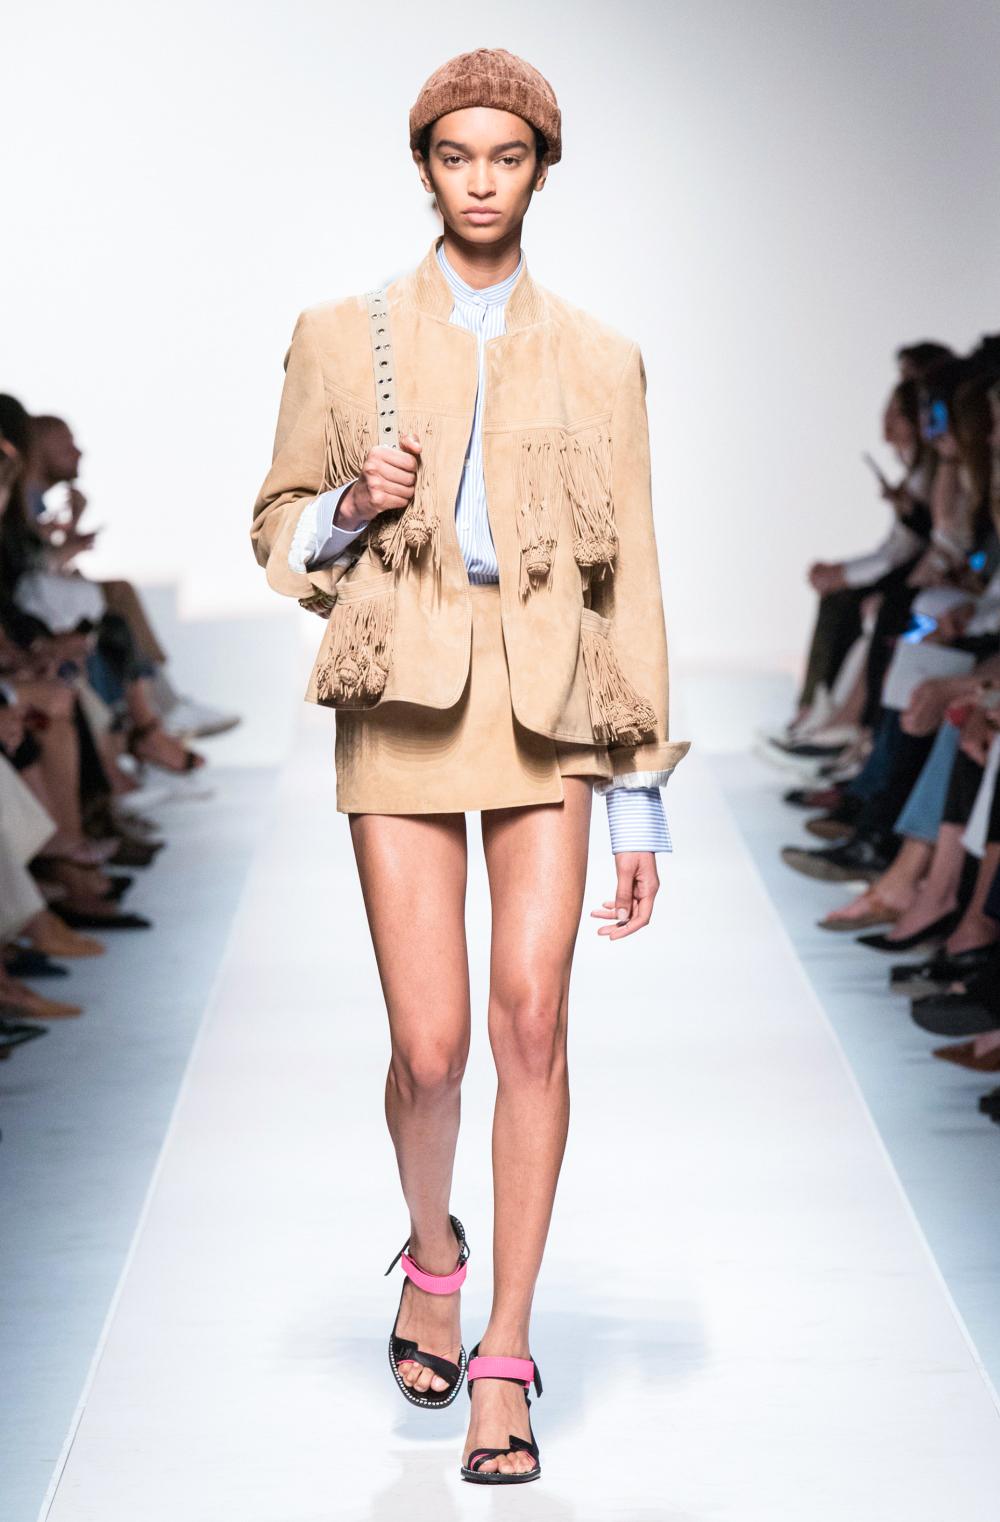 Ermanno Scervino Spring 2020 Collection - Runway at Milan Fashion Week